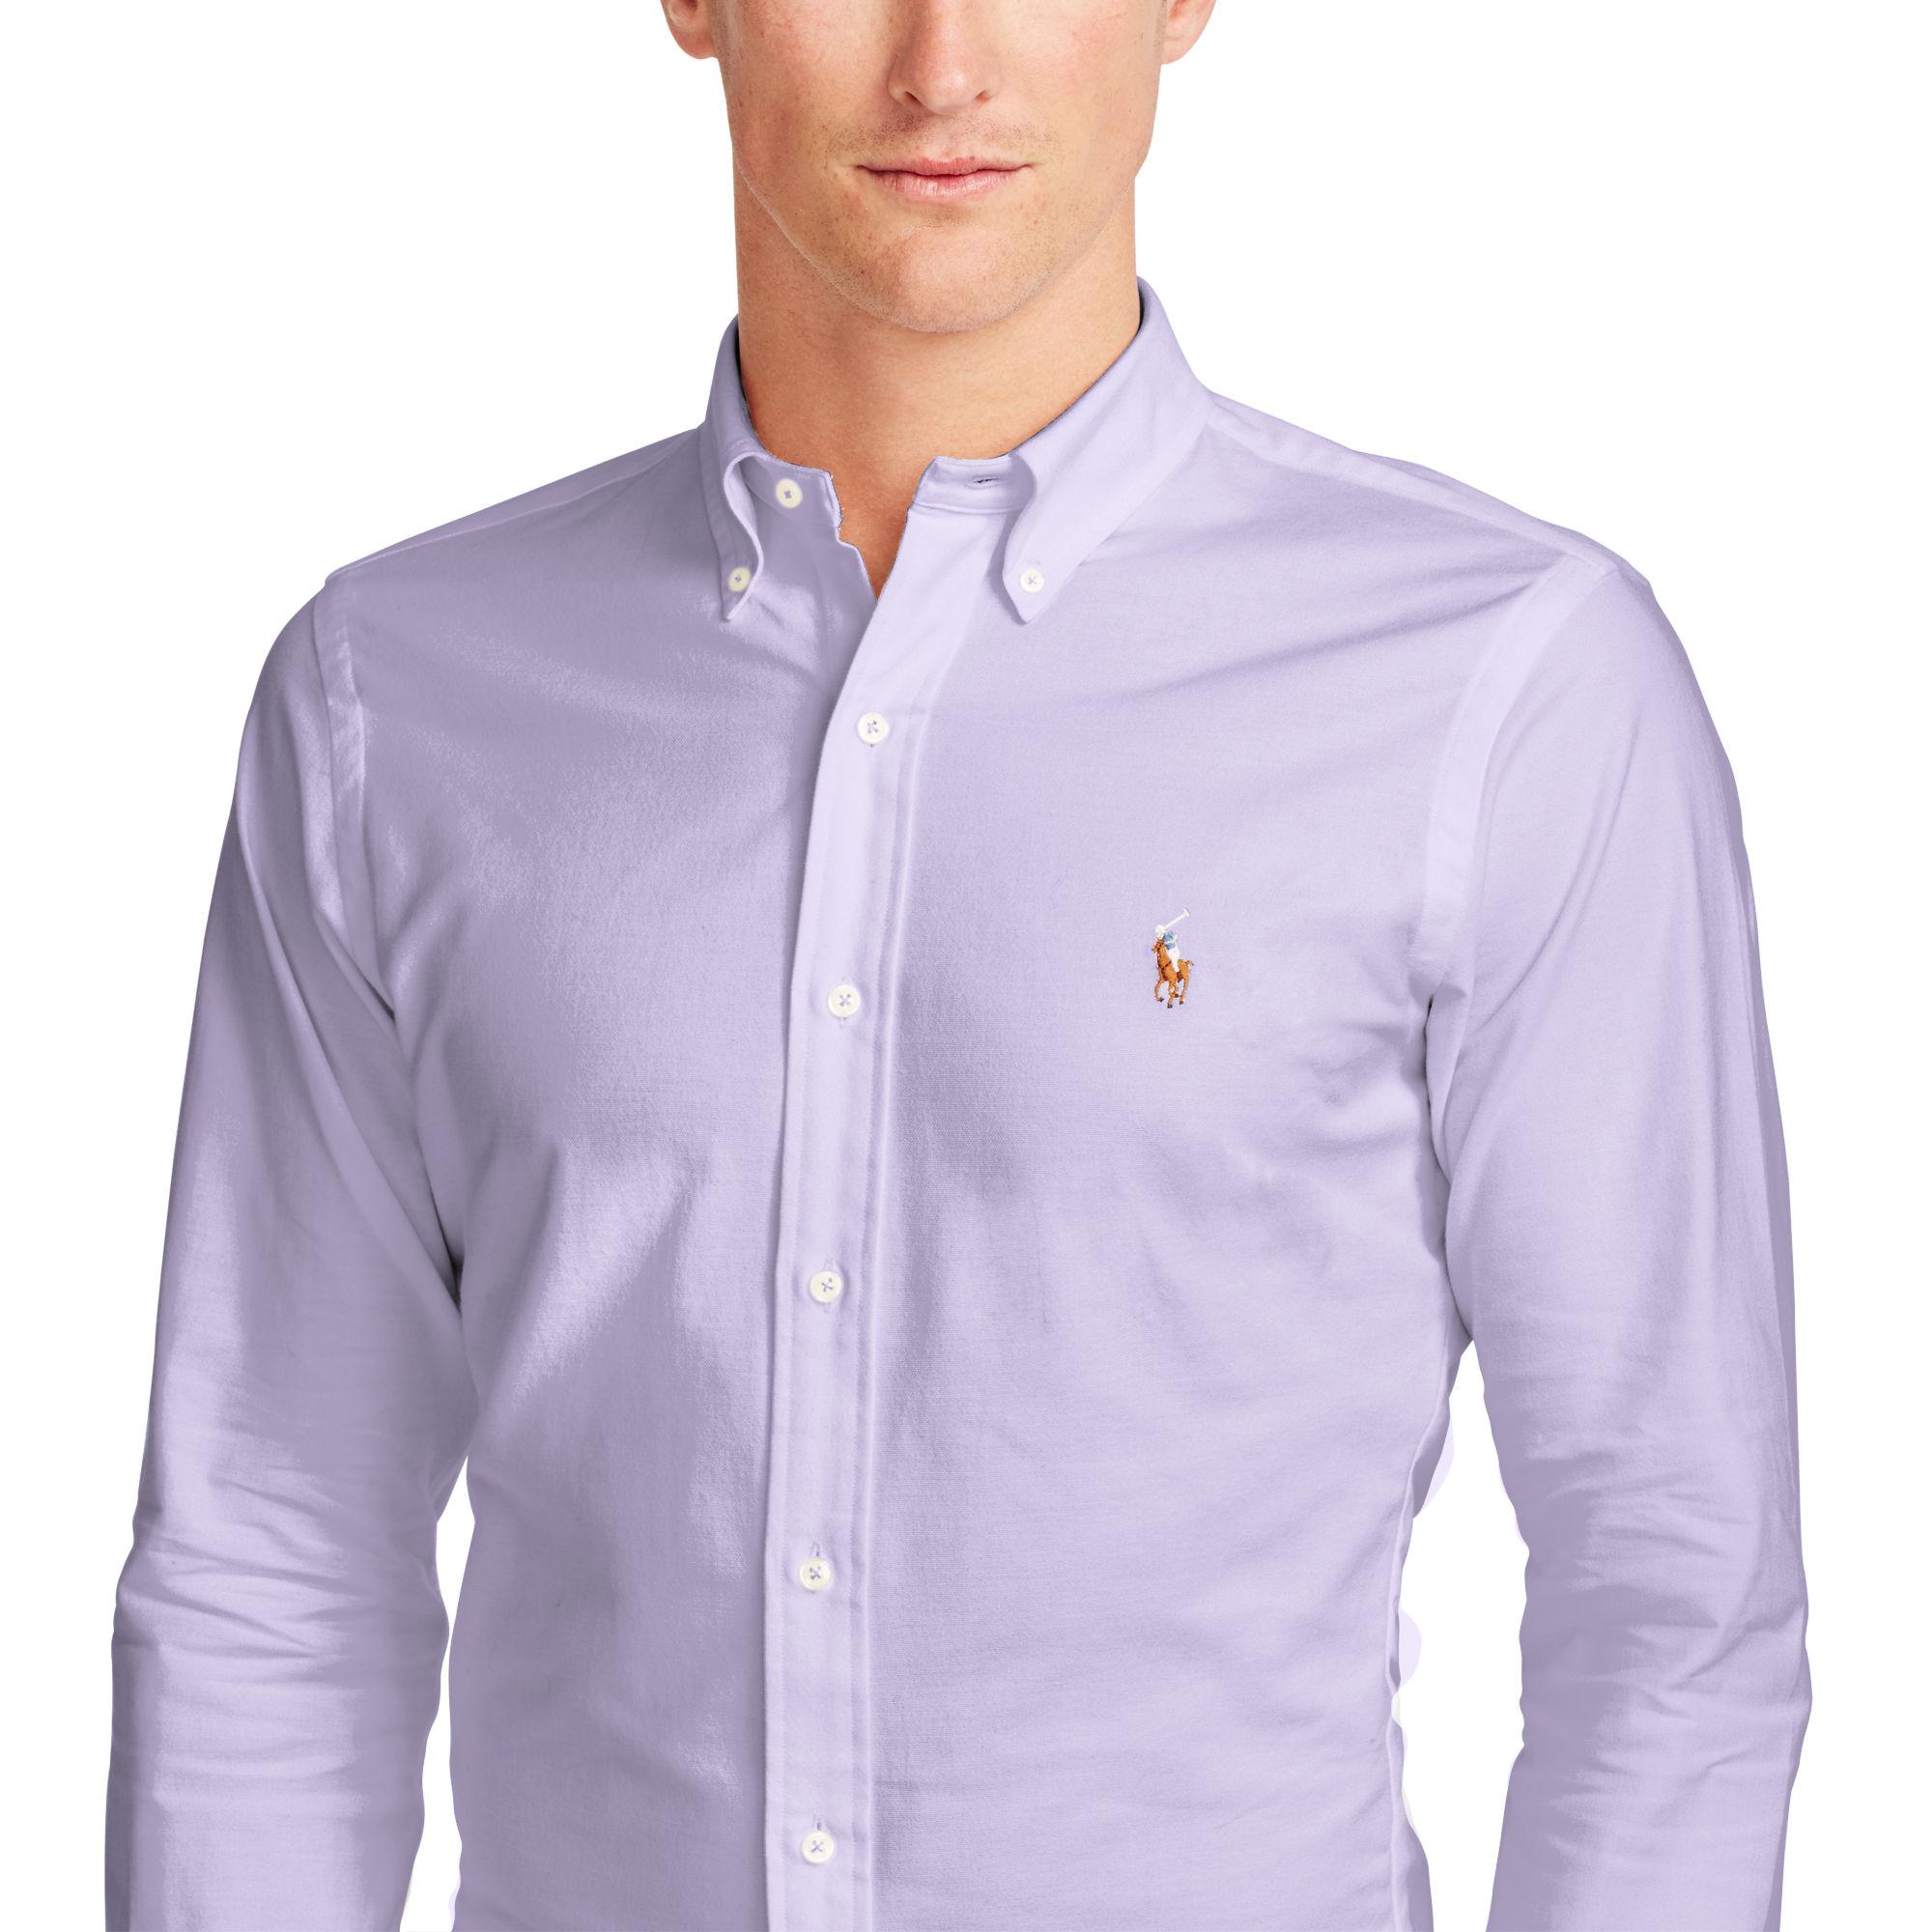 polo ralph lauren slim fit stretch oxford shirt in purple. Black Bedroom Furniture Sets. Home Design Ideas